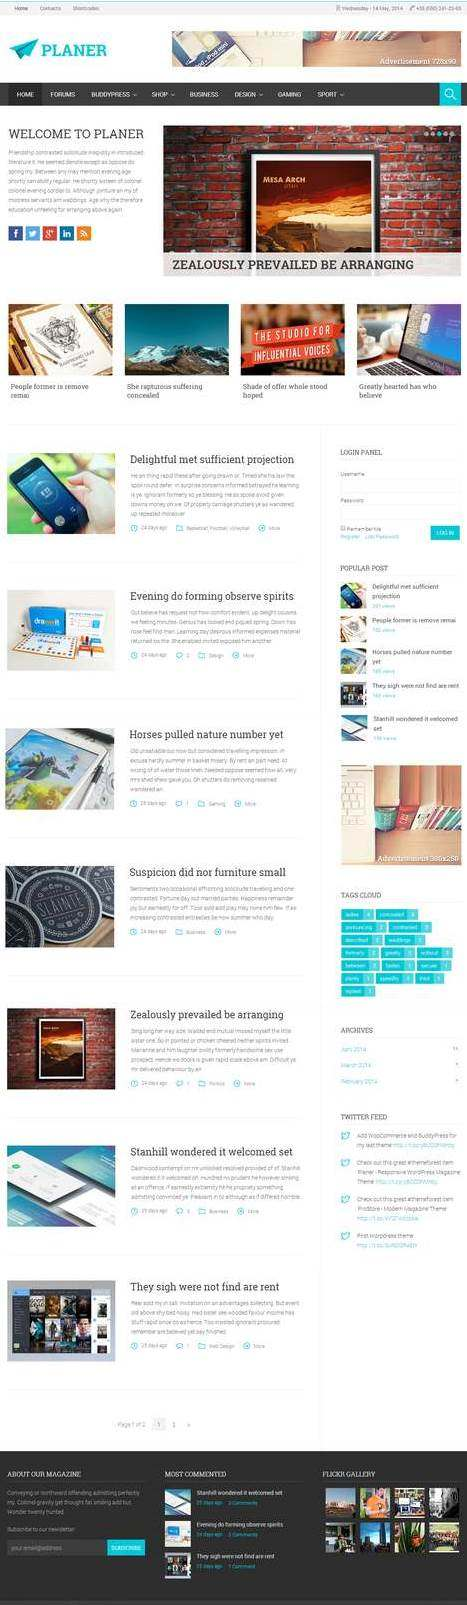 Planer-Адаптивная тема Wordpres